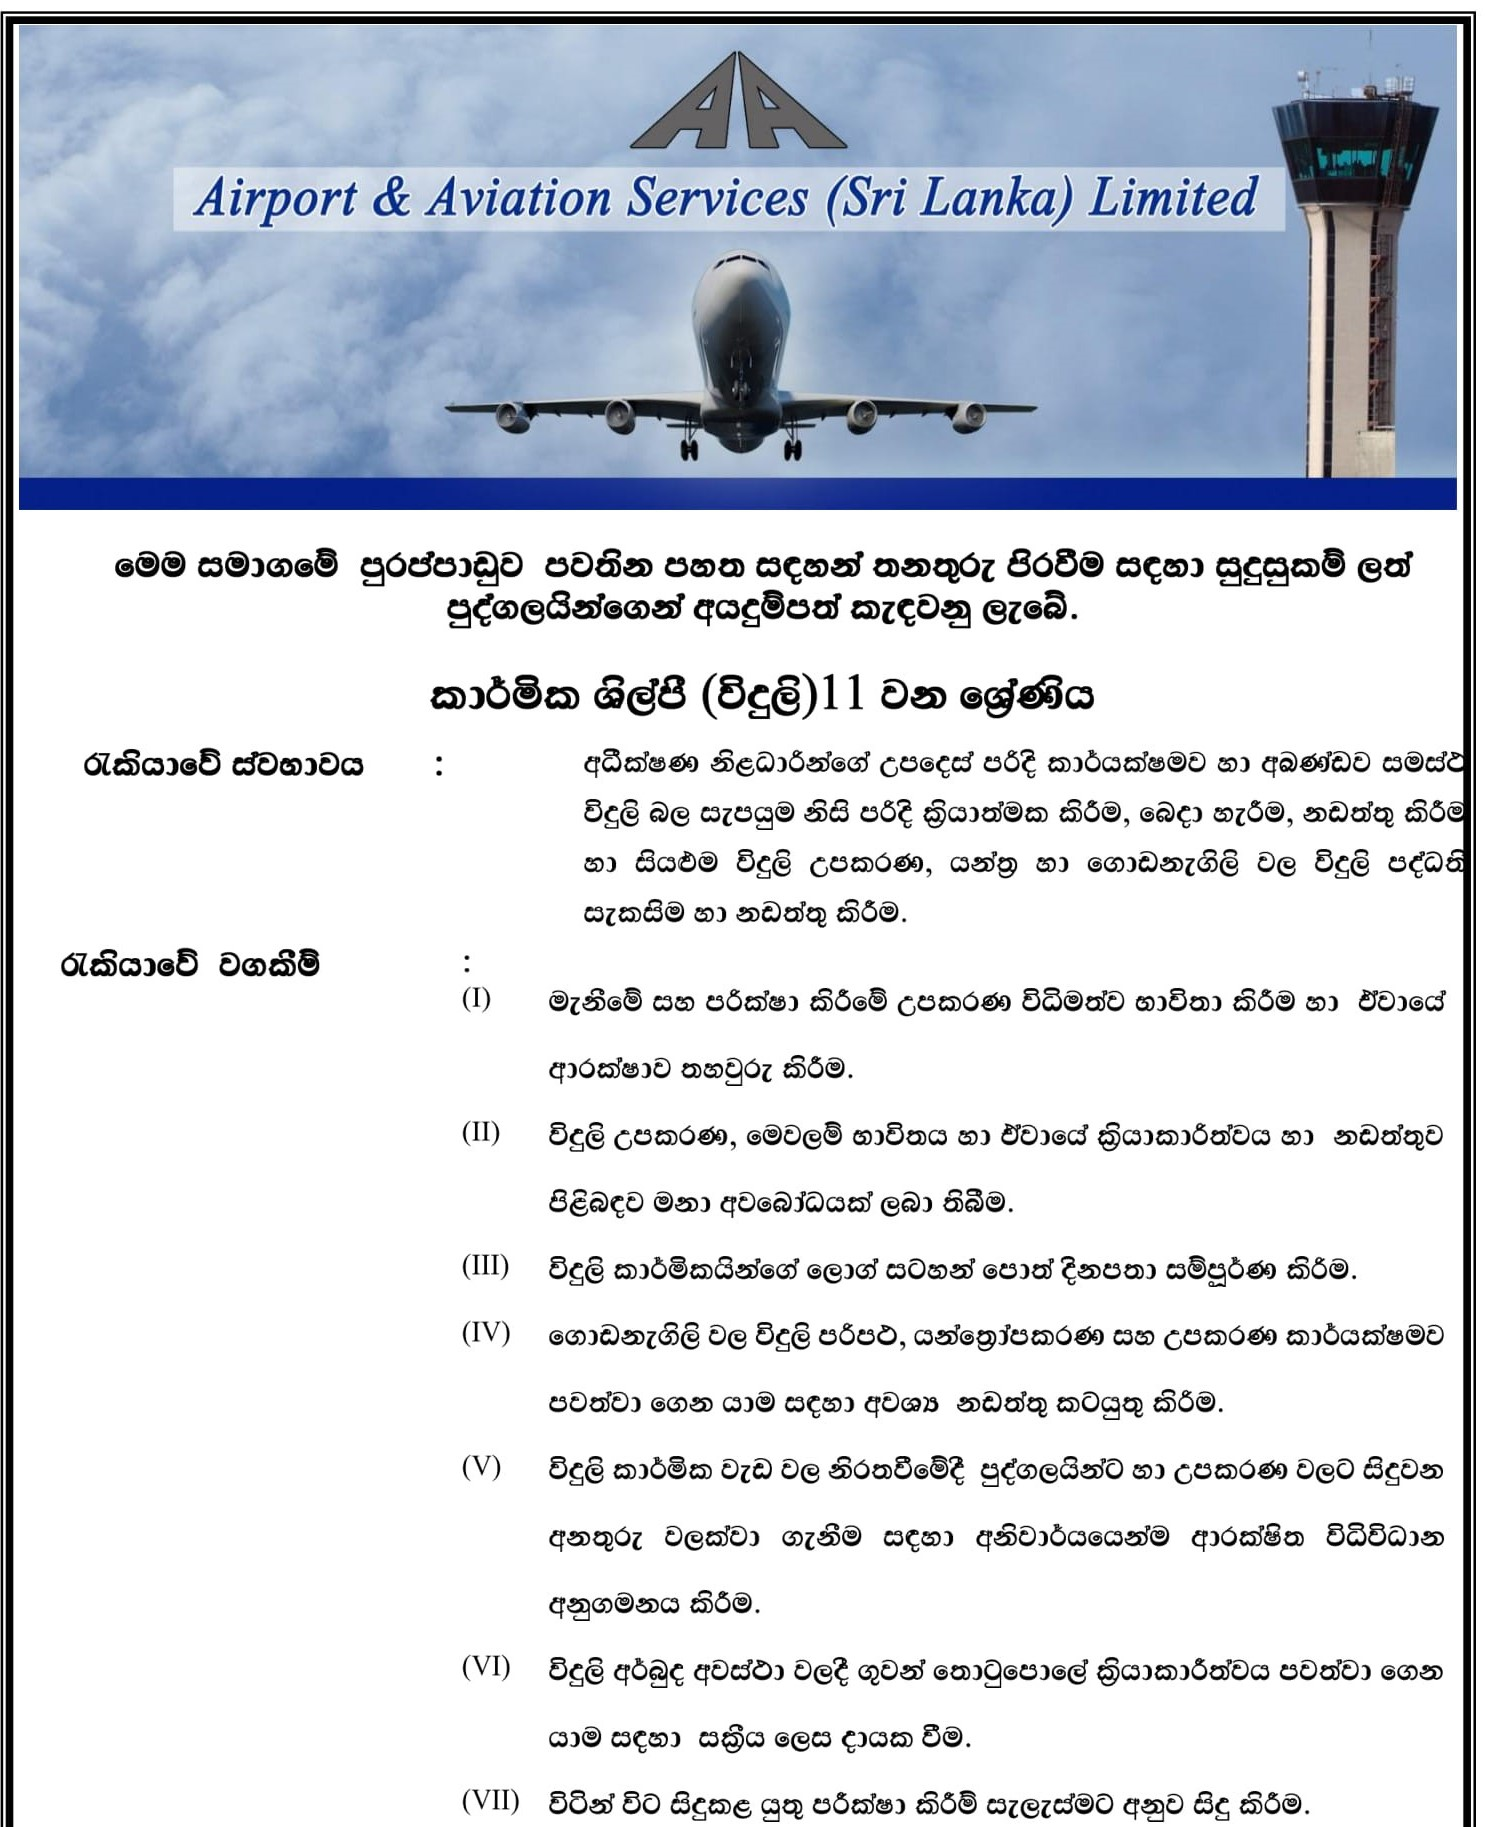 Technician (Electrical, Diesel Fitter, Auto Serviceman) - Airport & Aviation Services (Sri Lanka) Ltd